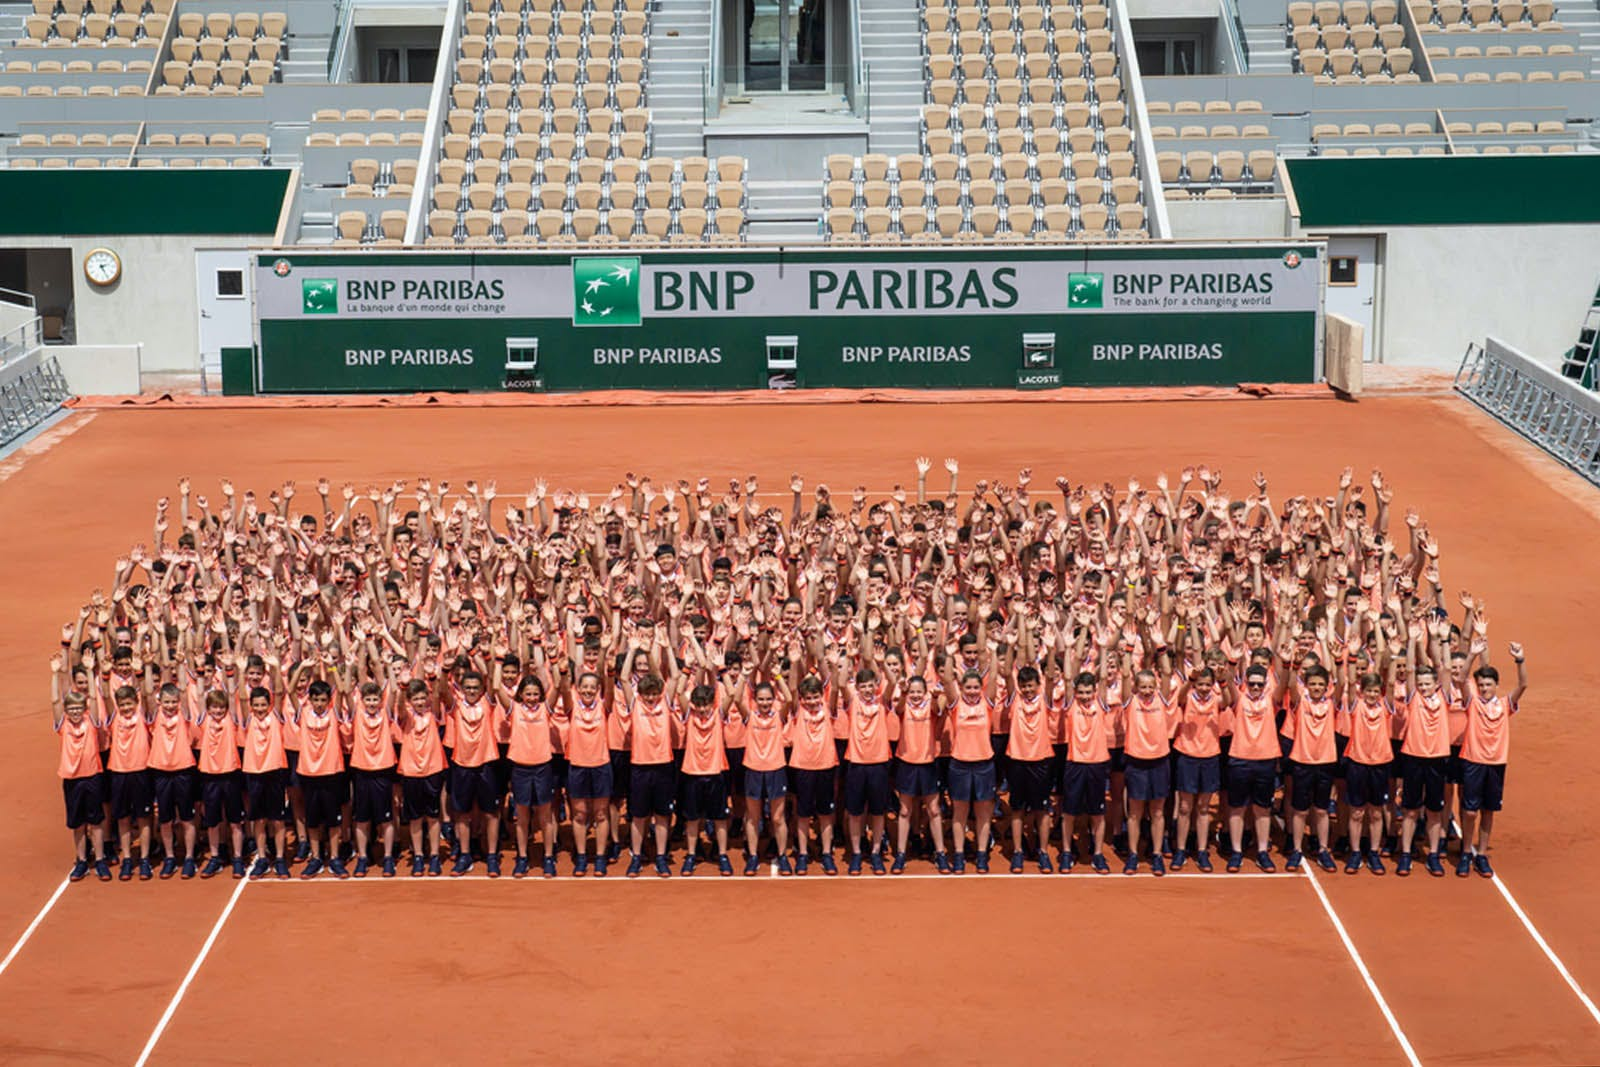 Roland-Garros 2019 - Ramasseurs de balles - Photo de groupe